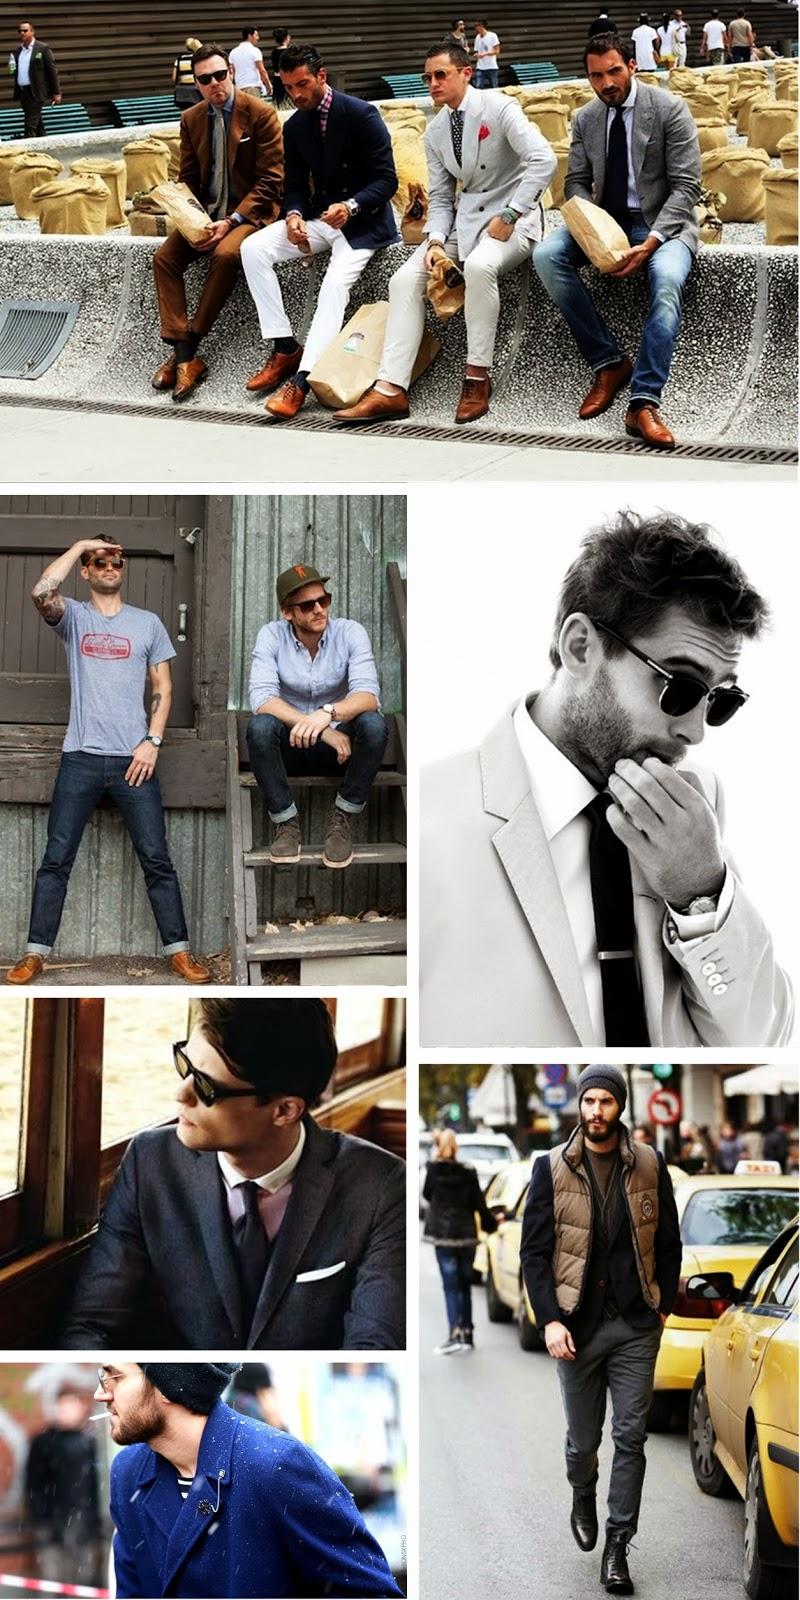 fashion blog blogger, style blogger blog, mens fashion, mens style, stylish men, inspiration, inspirational board, hot men, street style men